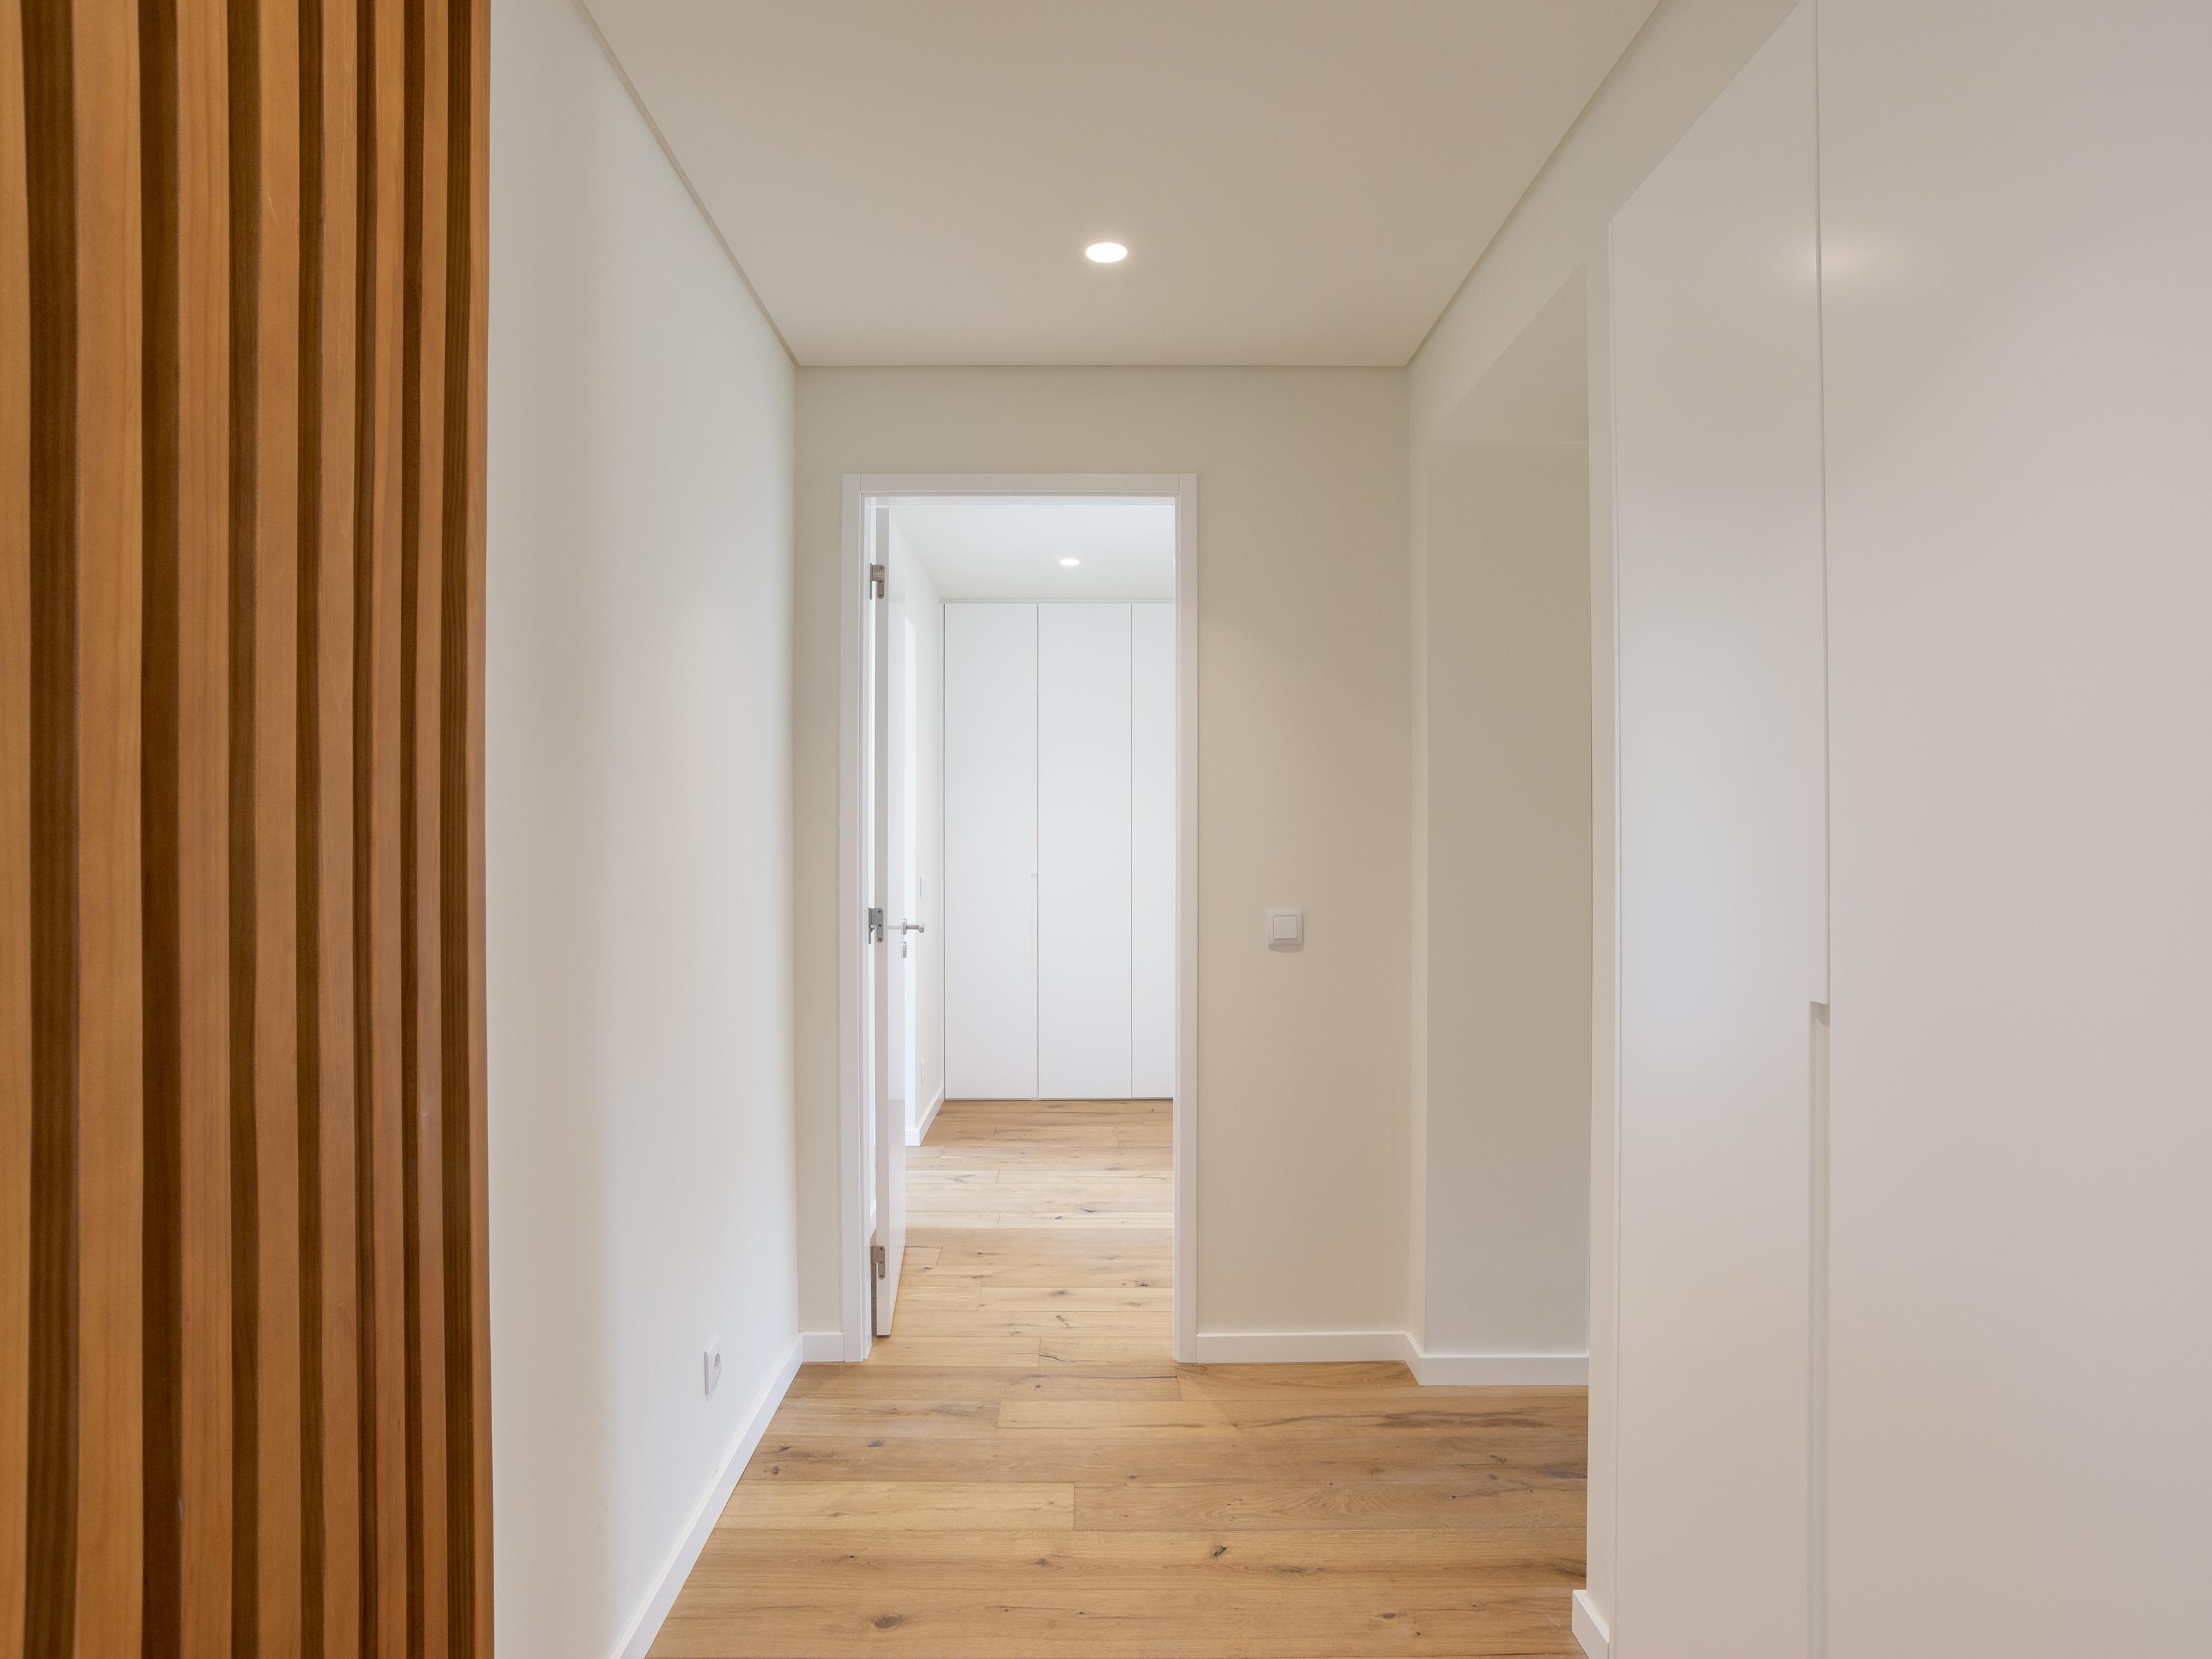 Refurbished Apartment in Av. da República (Nossa Senhora de Fátima) – 180 m²